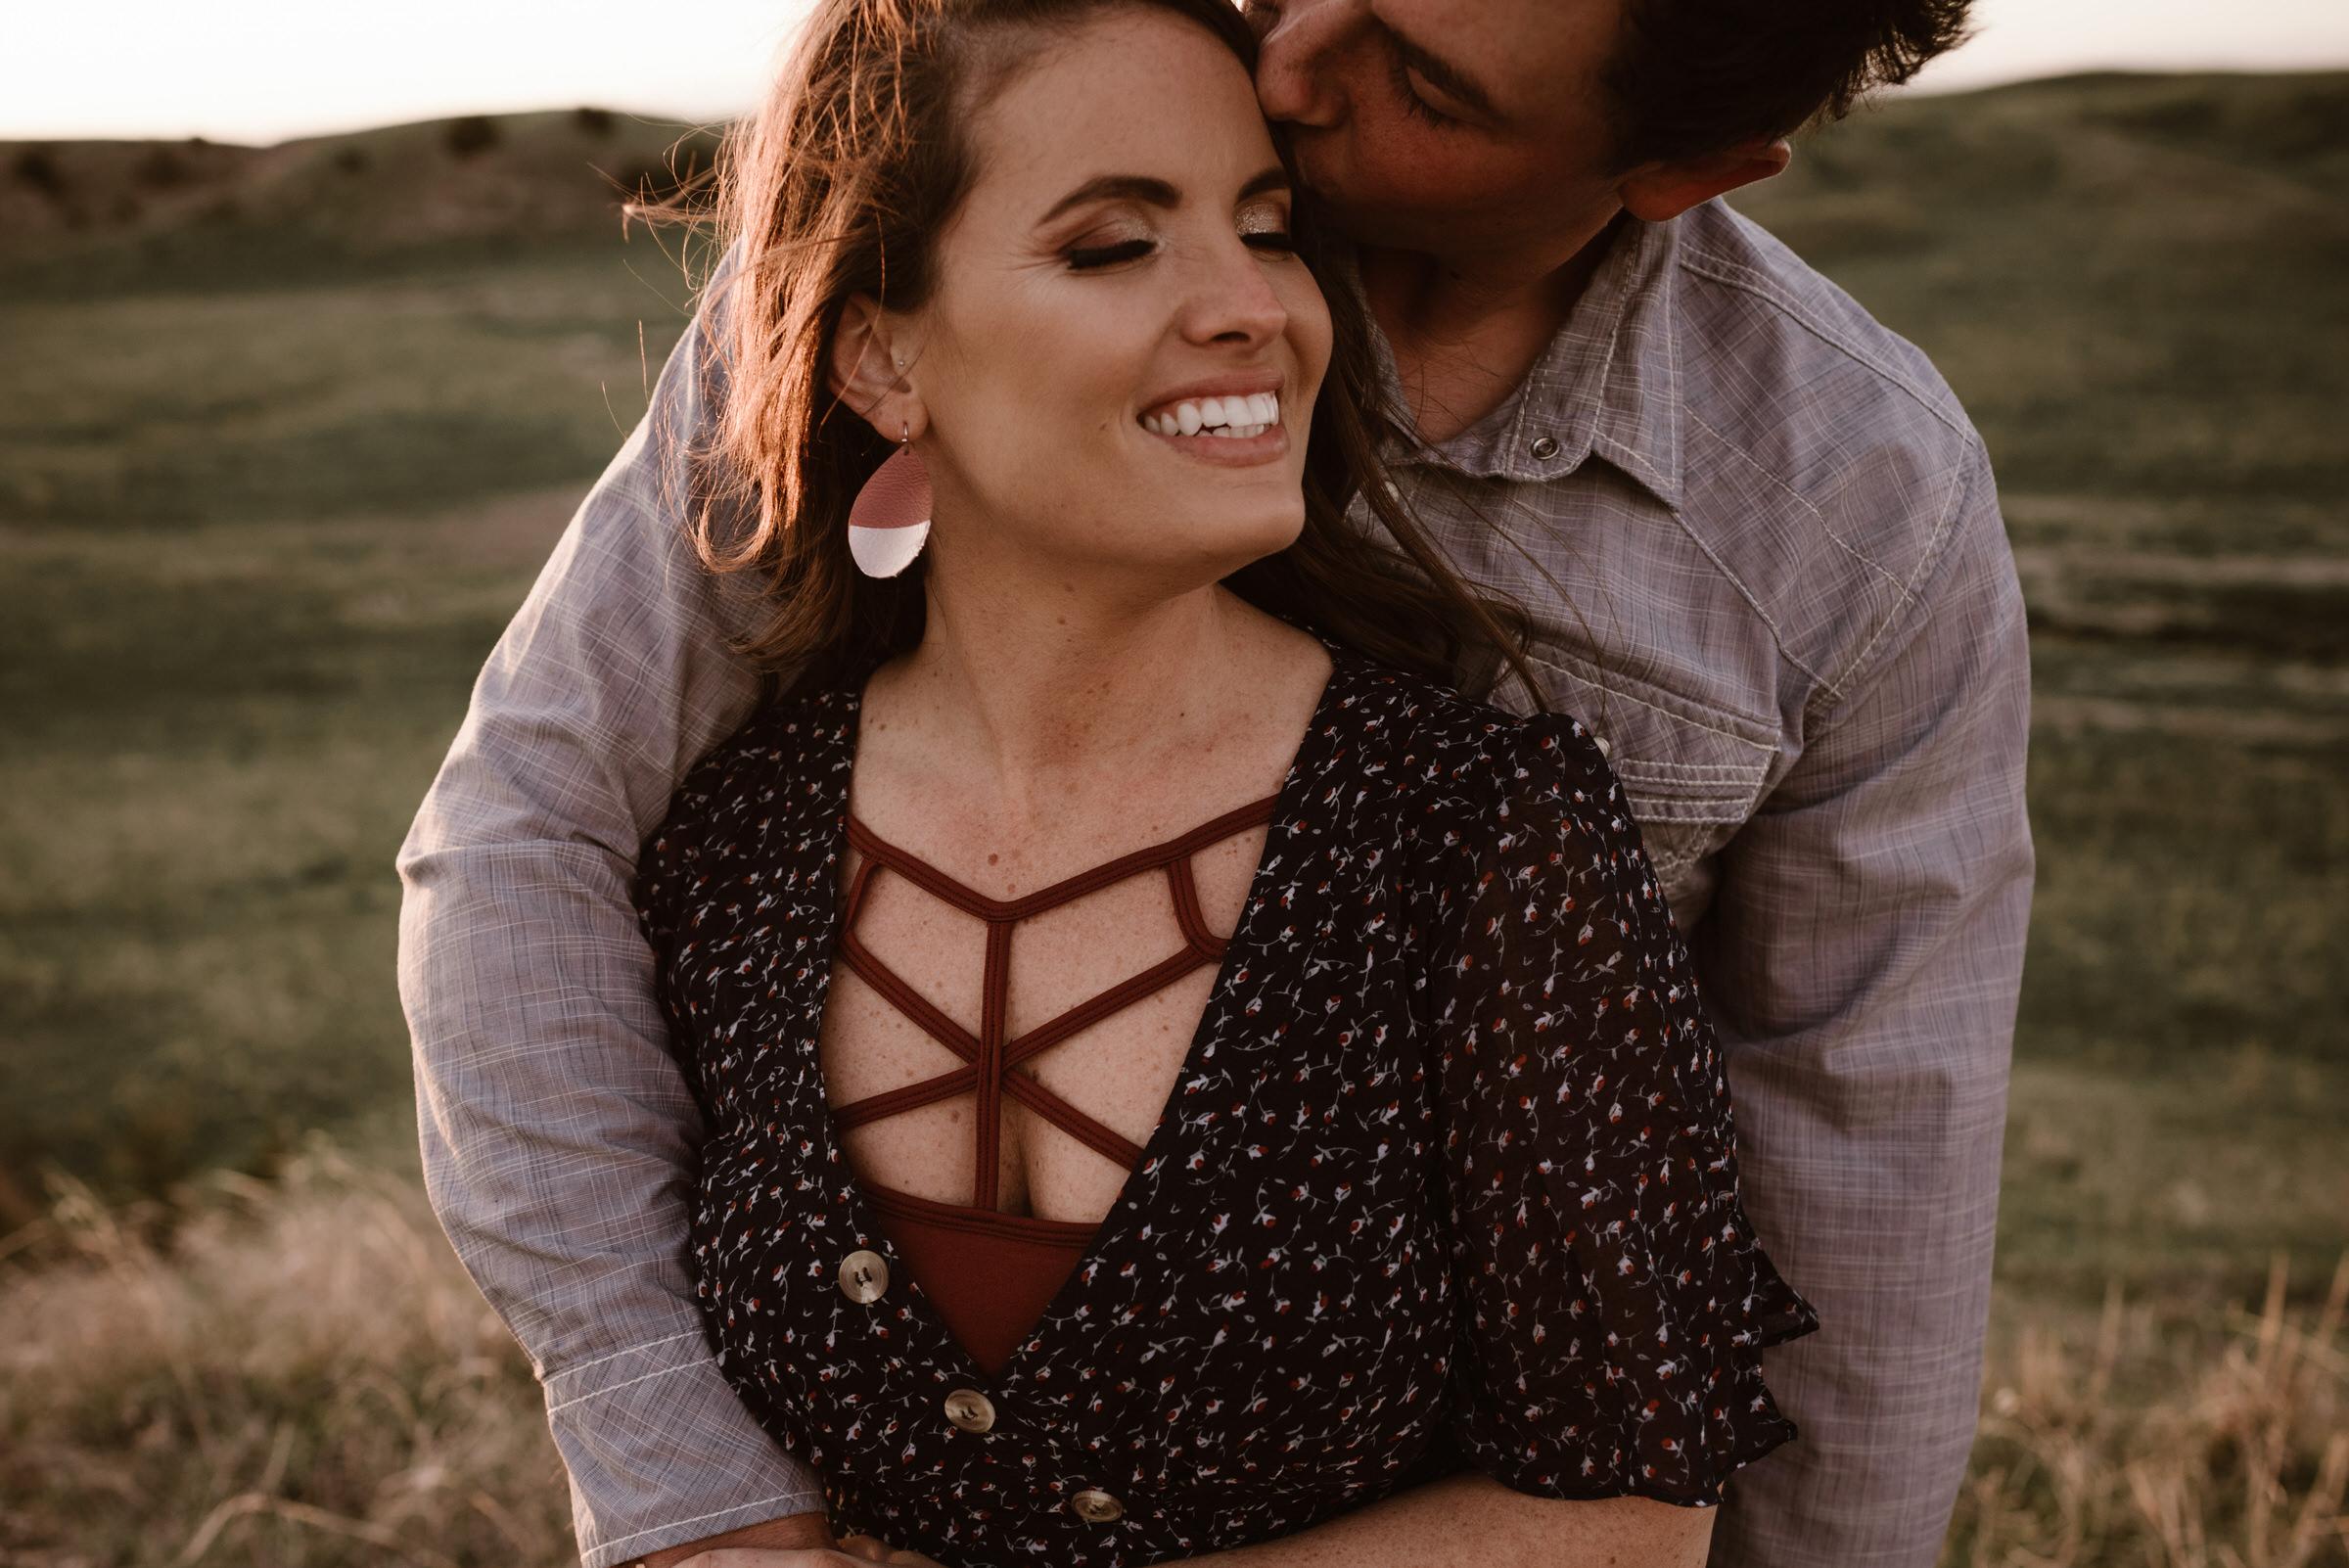 Sandhills-Nebraska-Engagement-Wedding-Photographer-Kaylie-Sirek-Photography-036.jpg